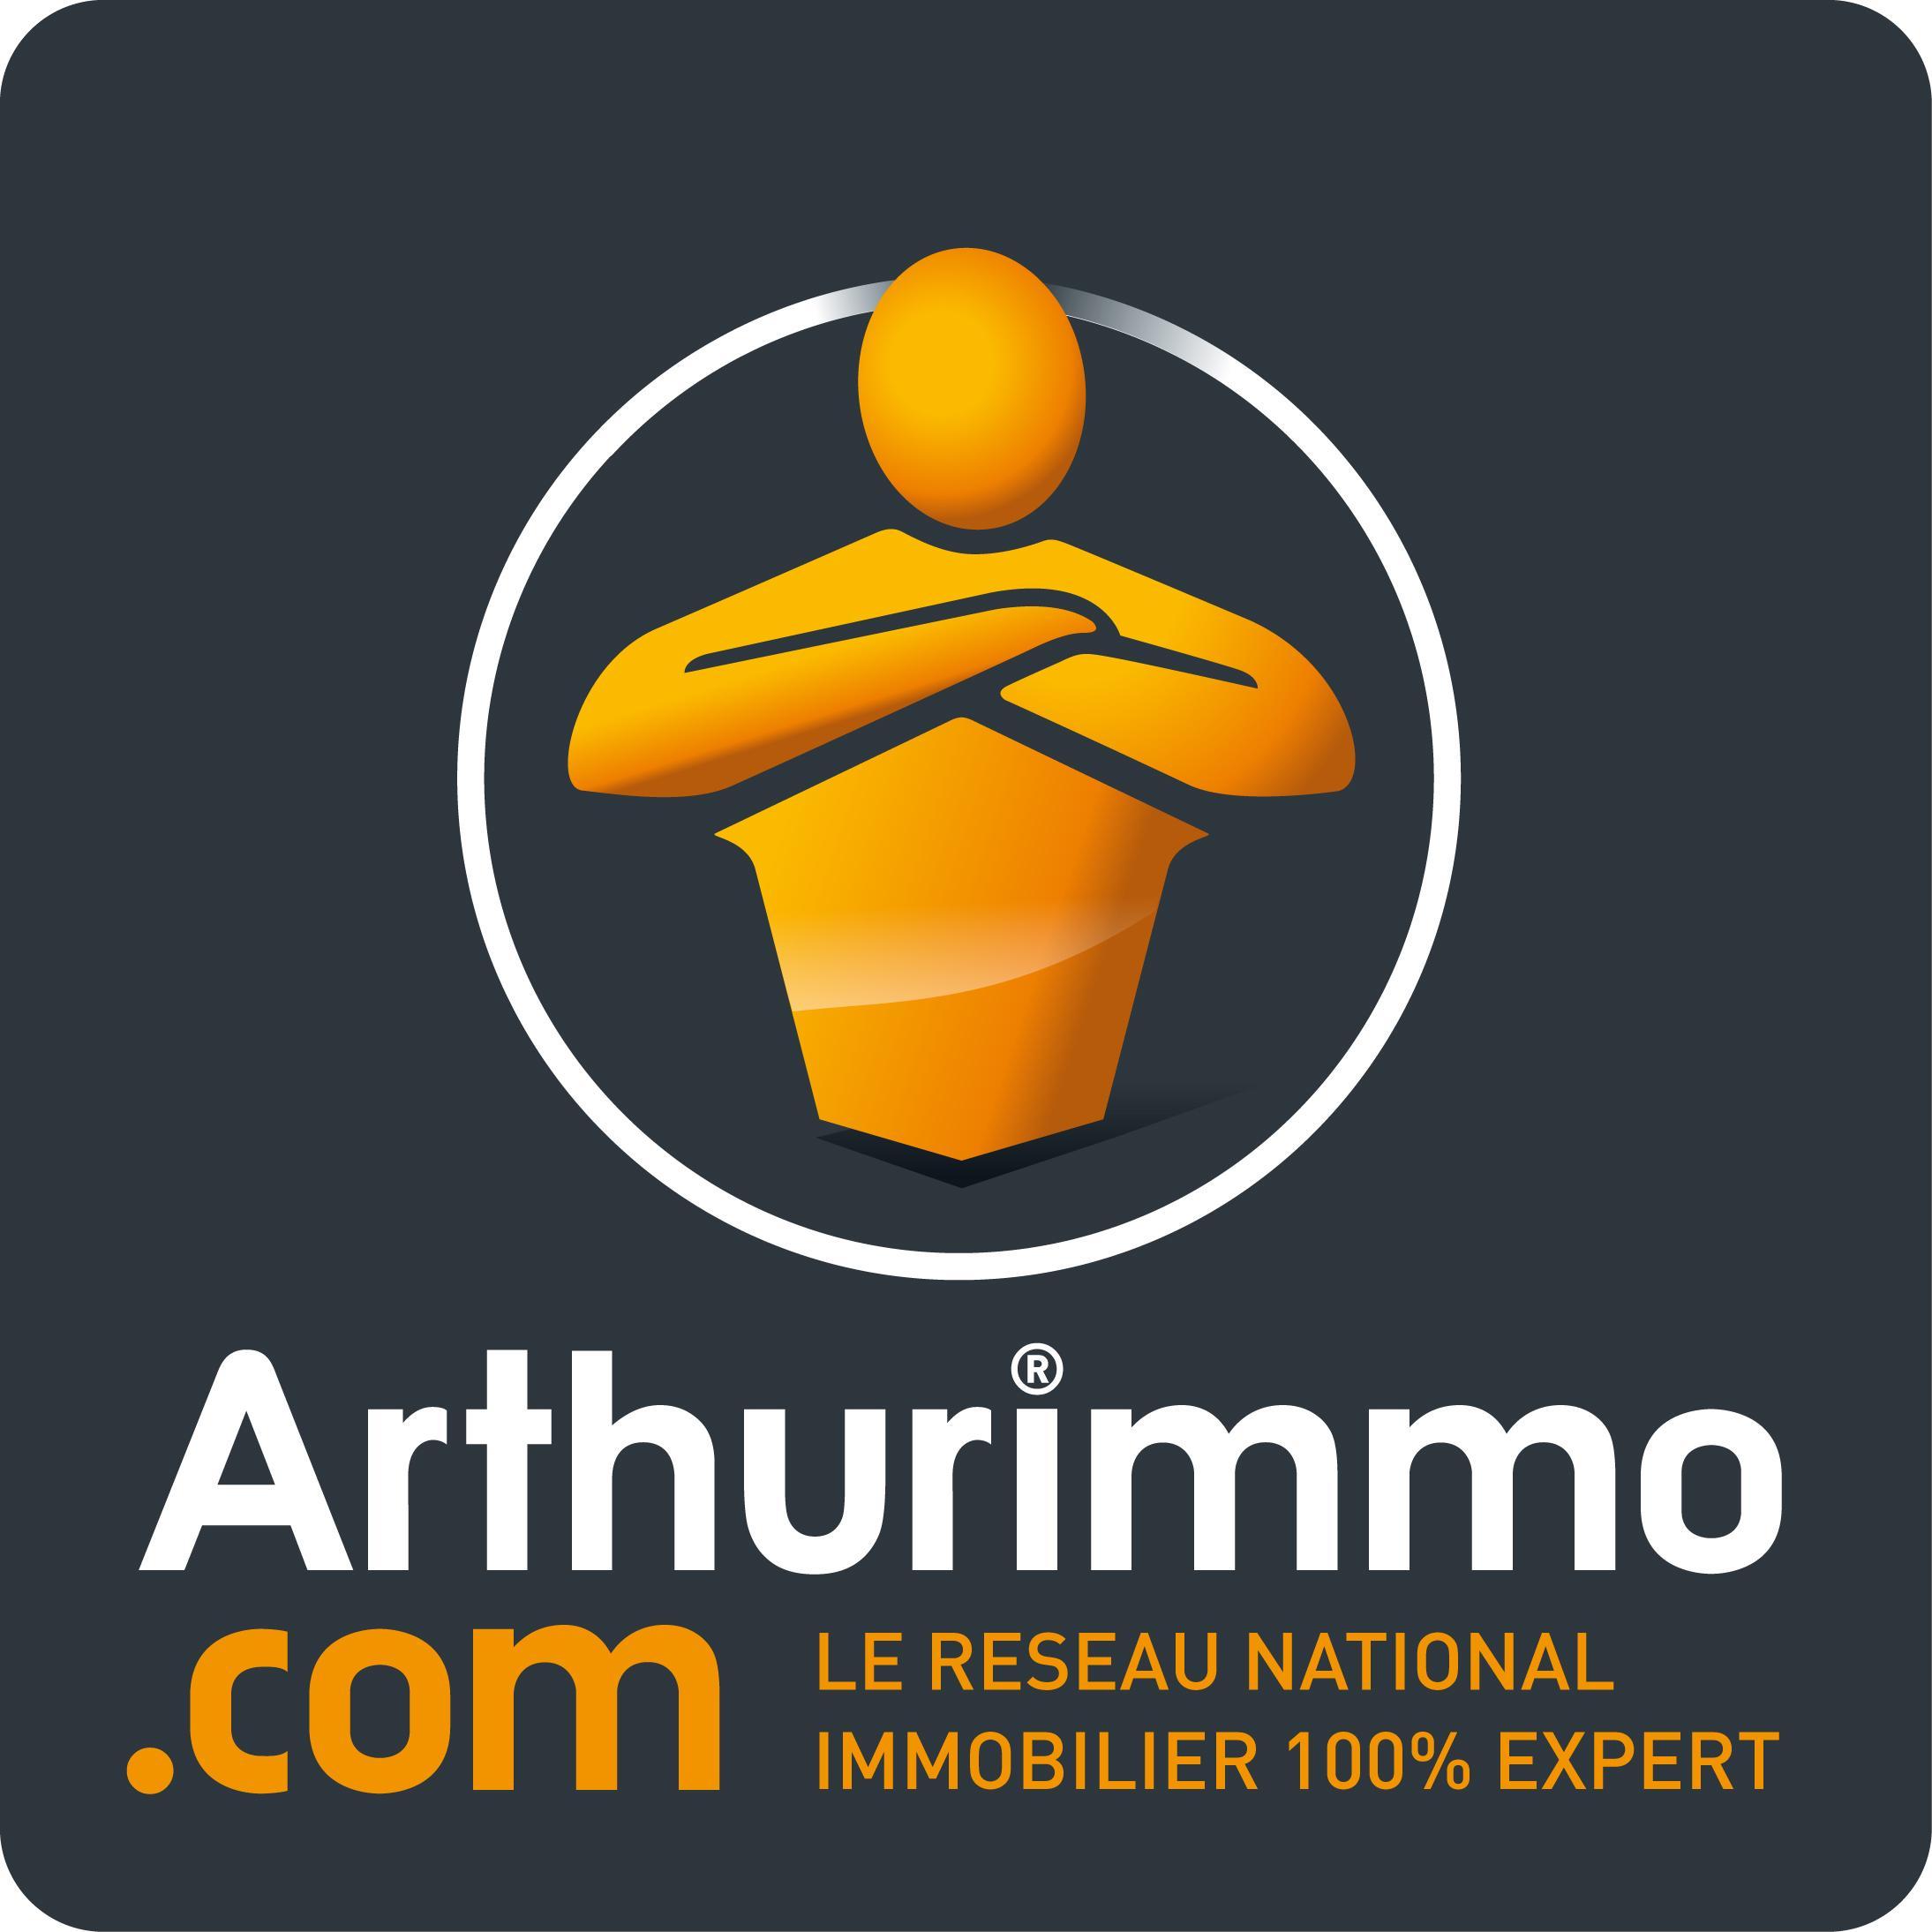 Arthurimmo.com Mouans Sartoux agence immobilière Mouans-Sartoux (06370)